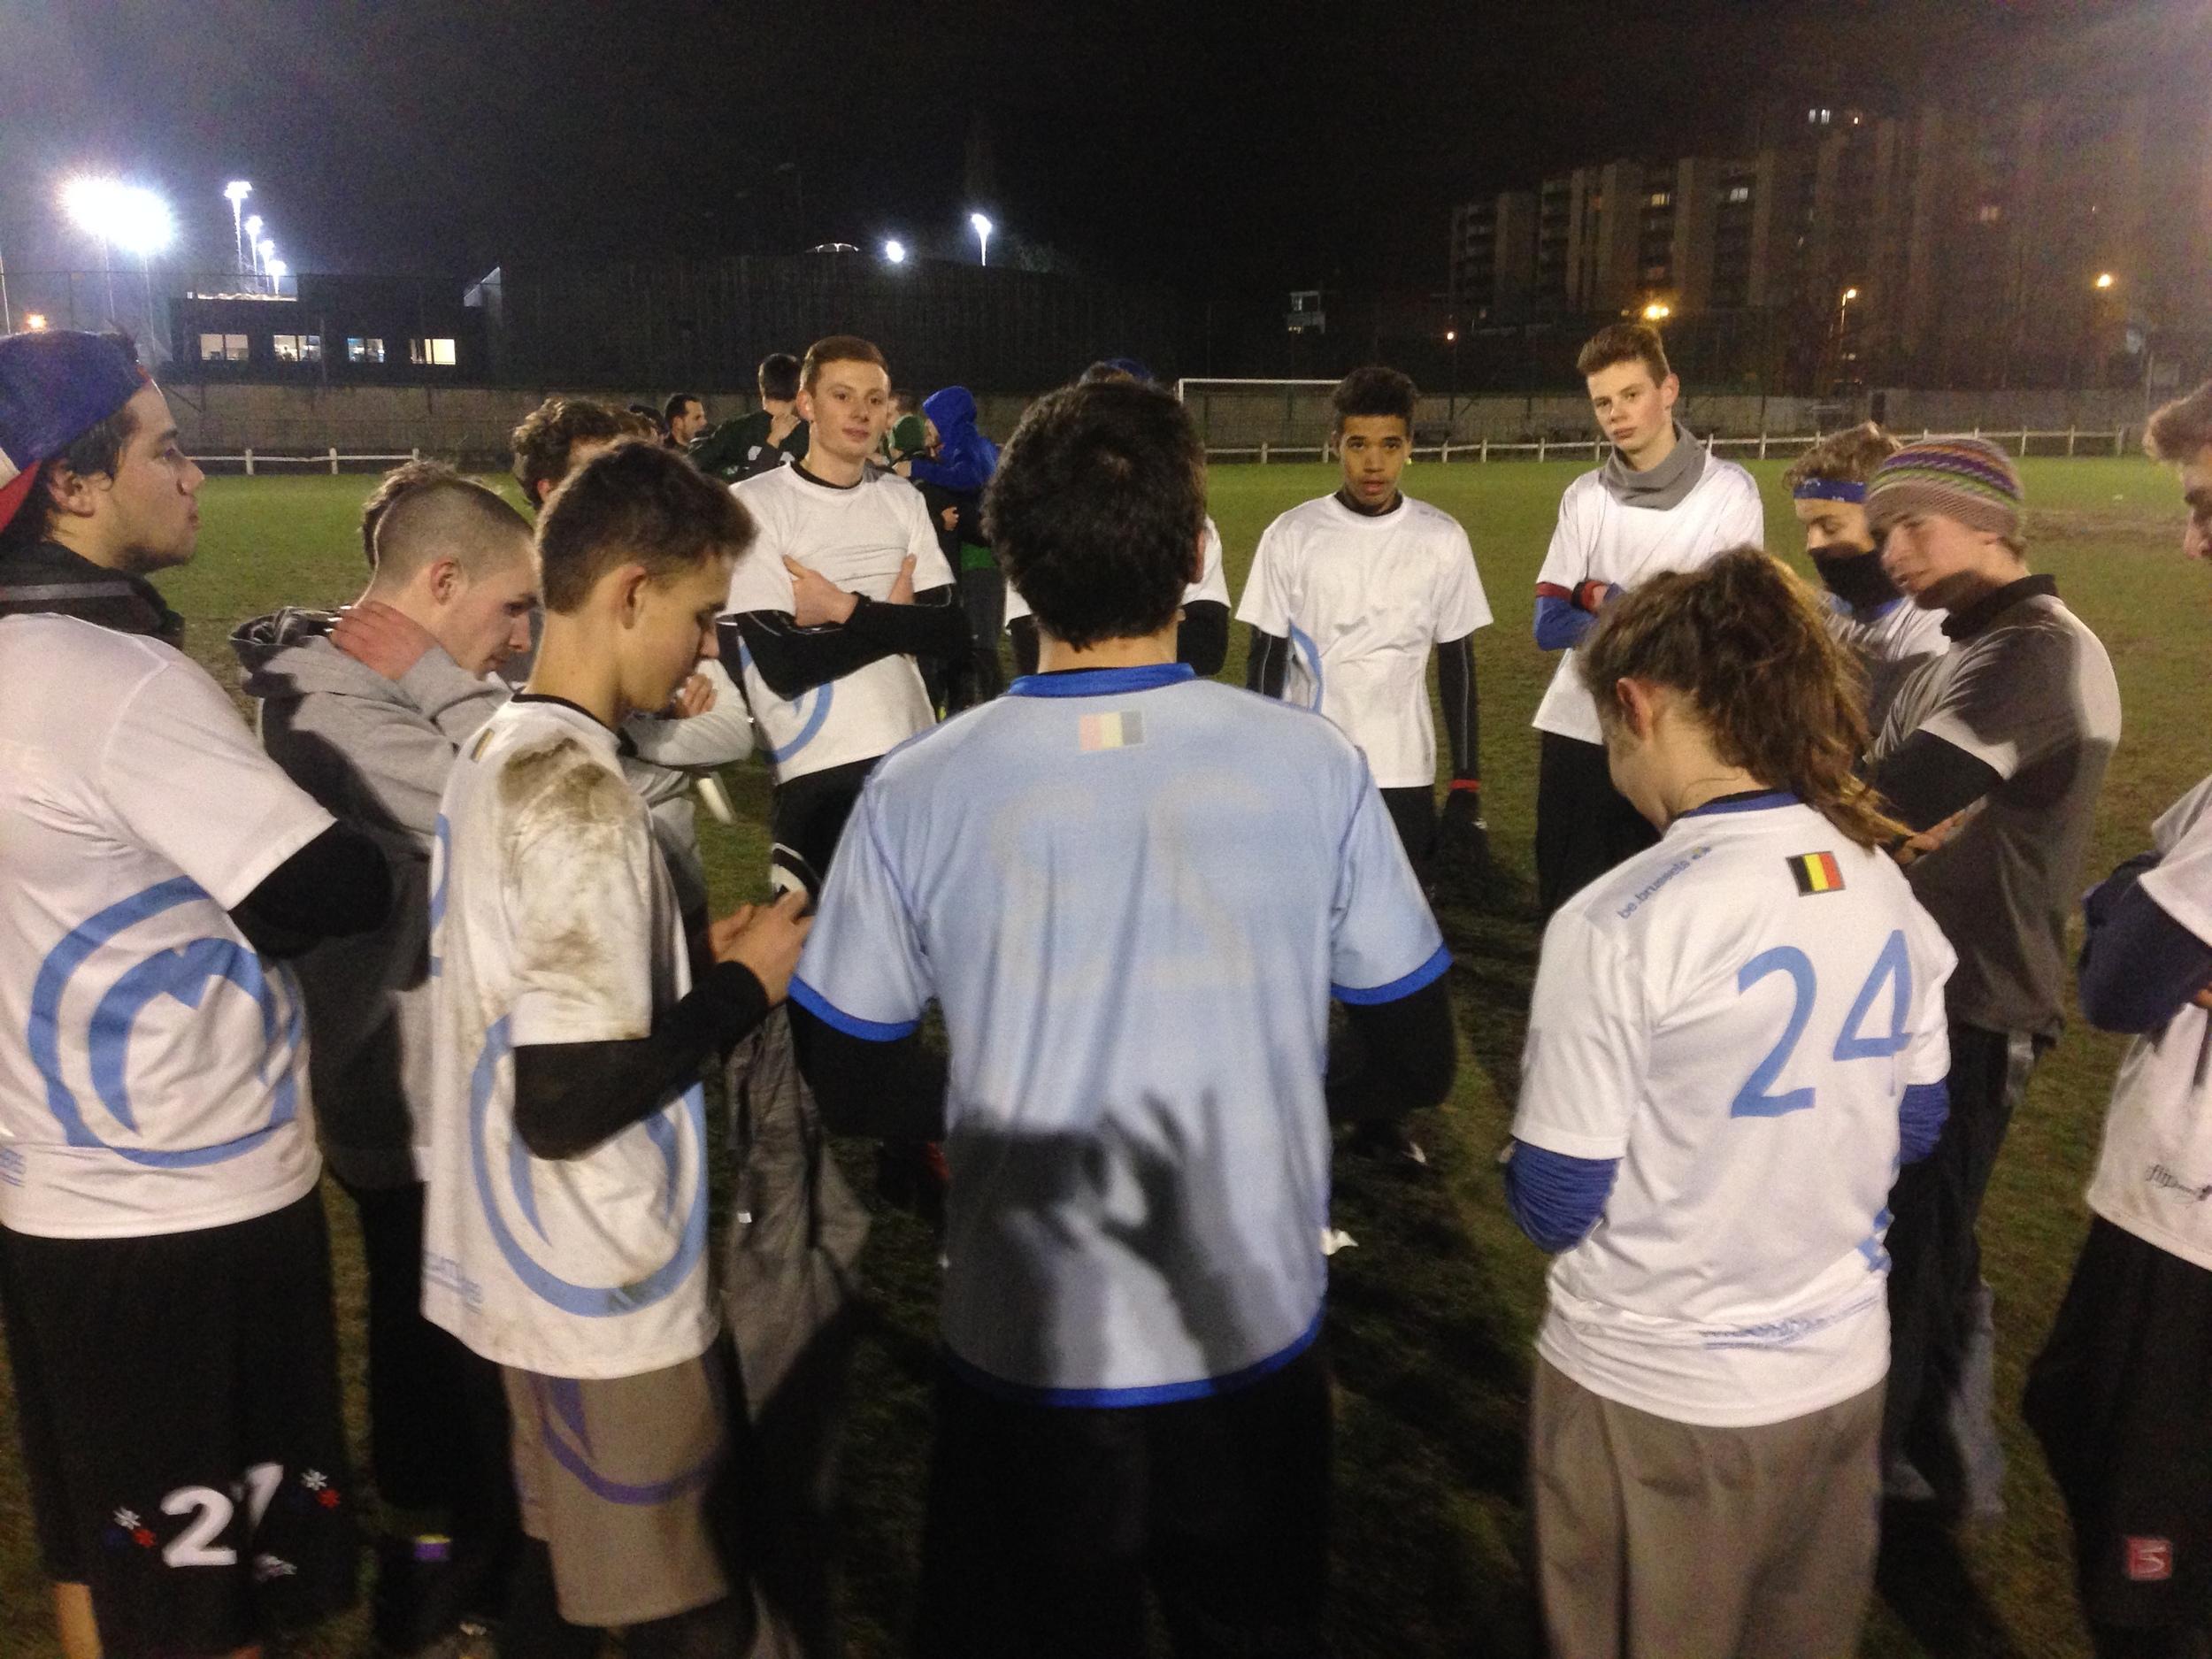 The U23 Mooncatchers, led by their captain V. Ouchinsky